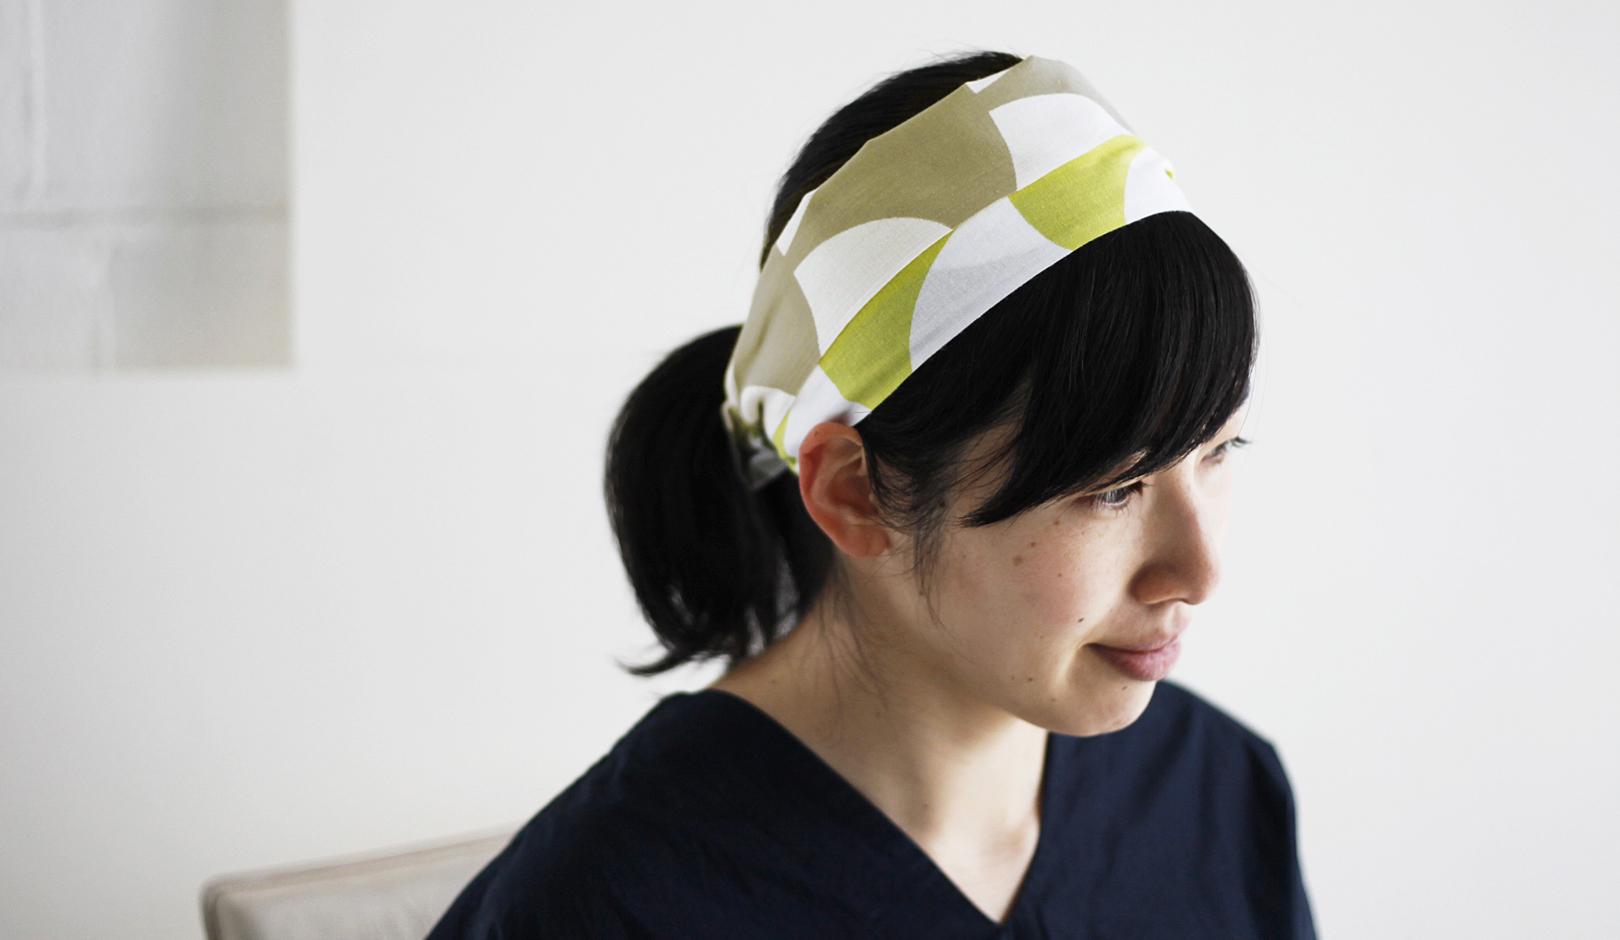 銀杏散る - Ichou-Chiru